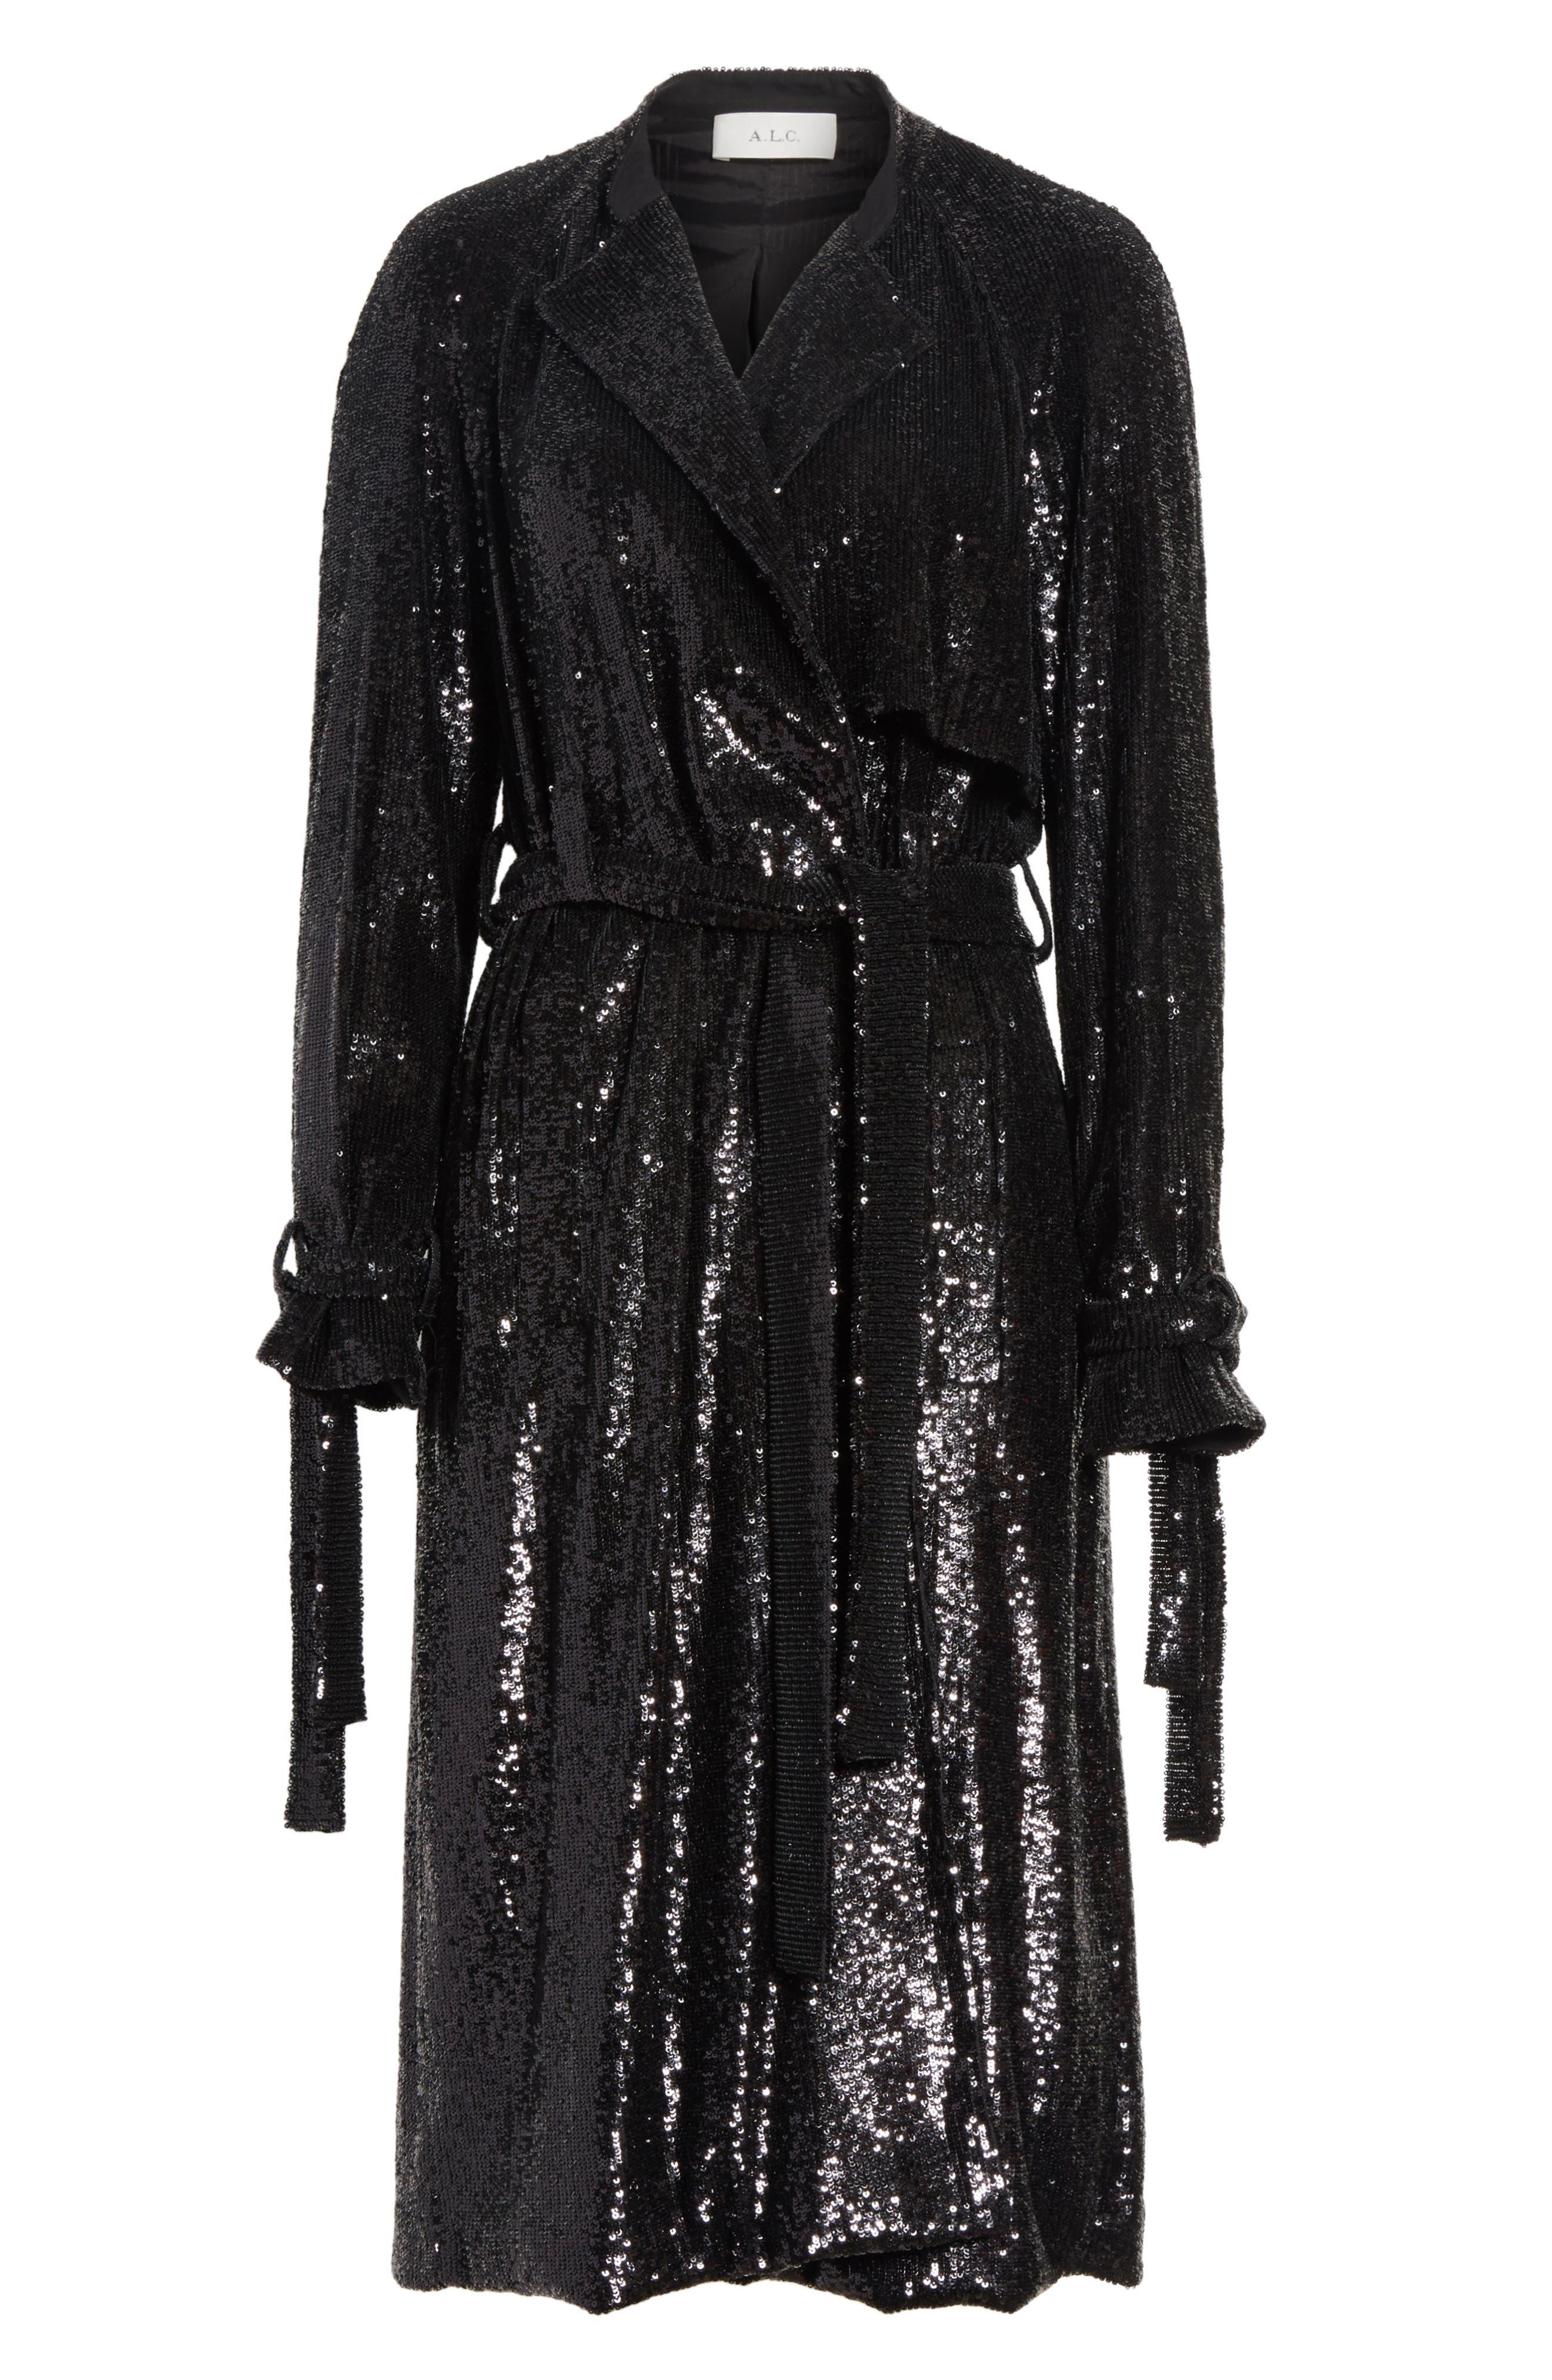 Holloway Sequin Coat,                             Alternate thumbnail 5, color,                             001